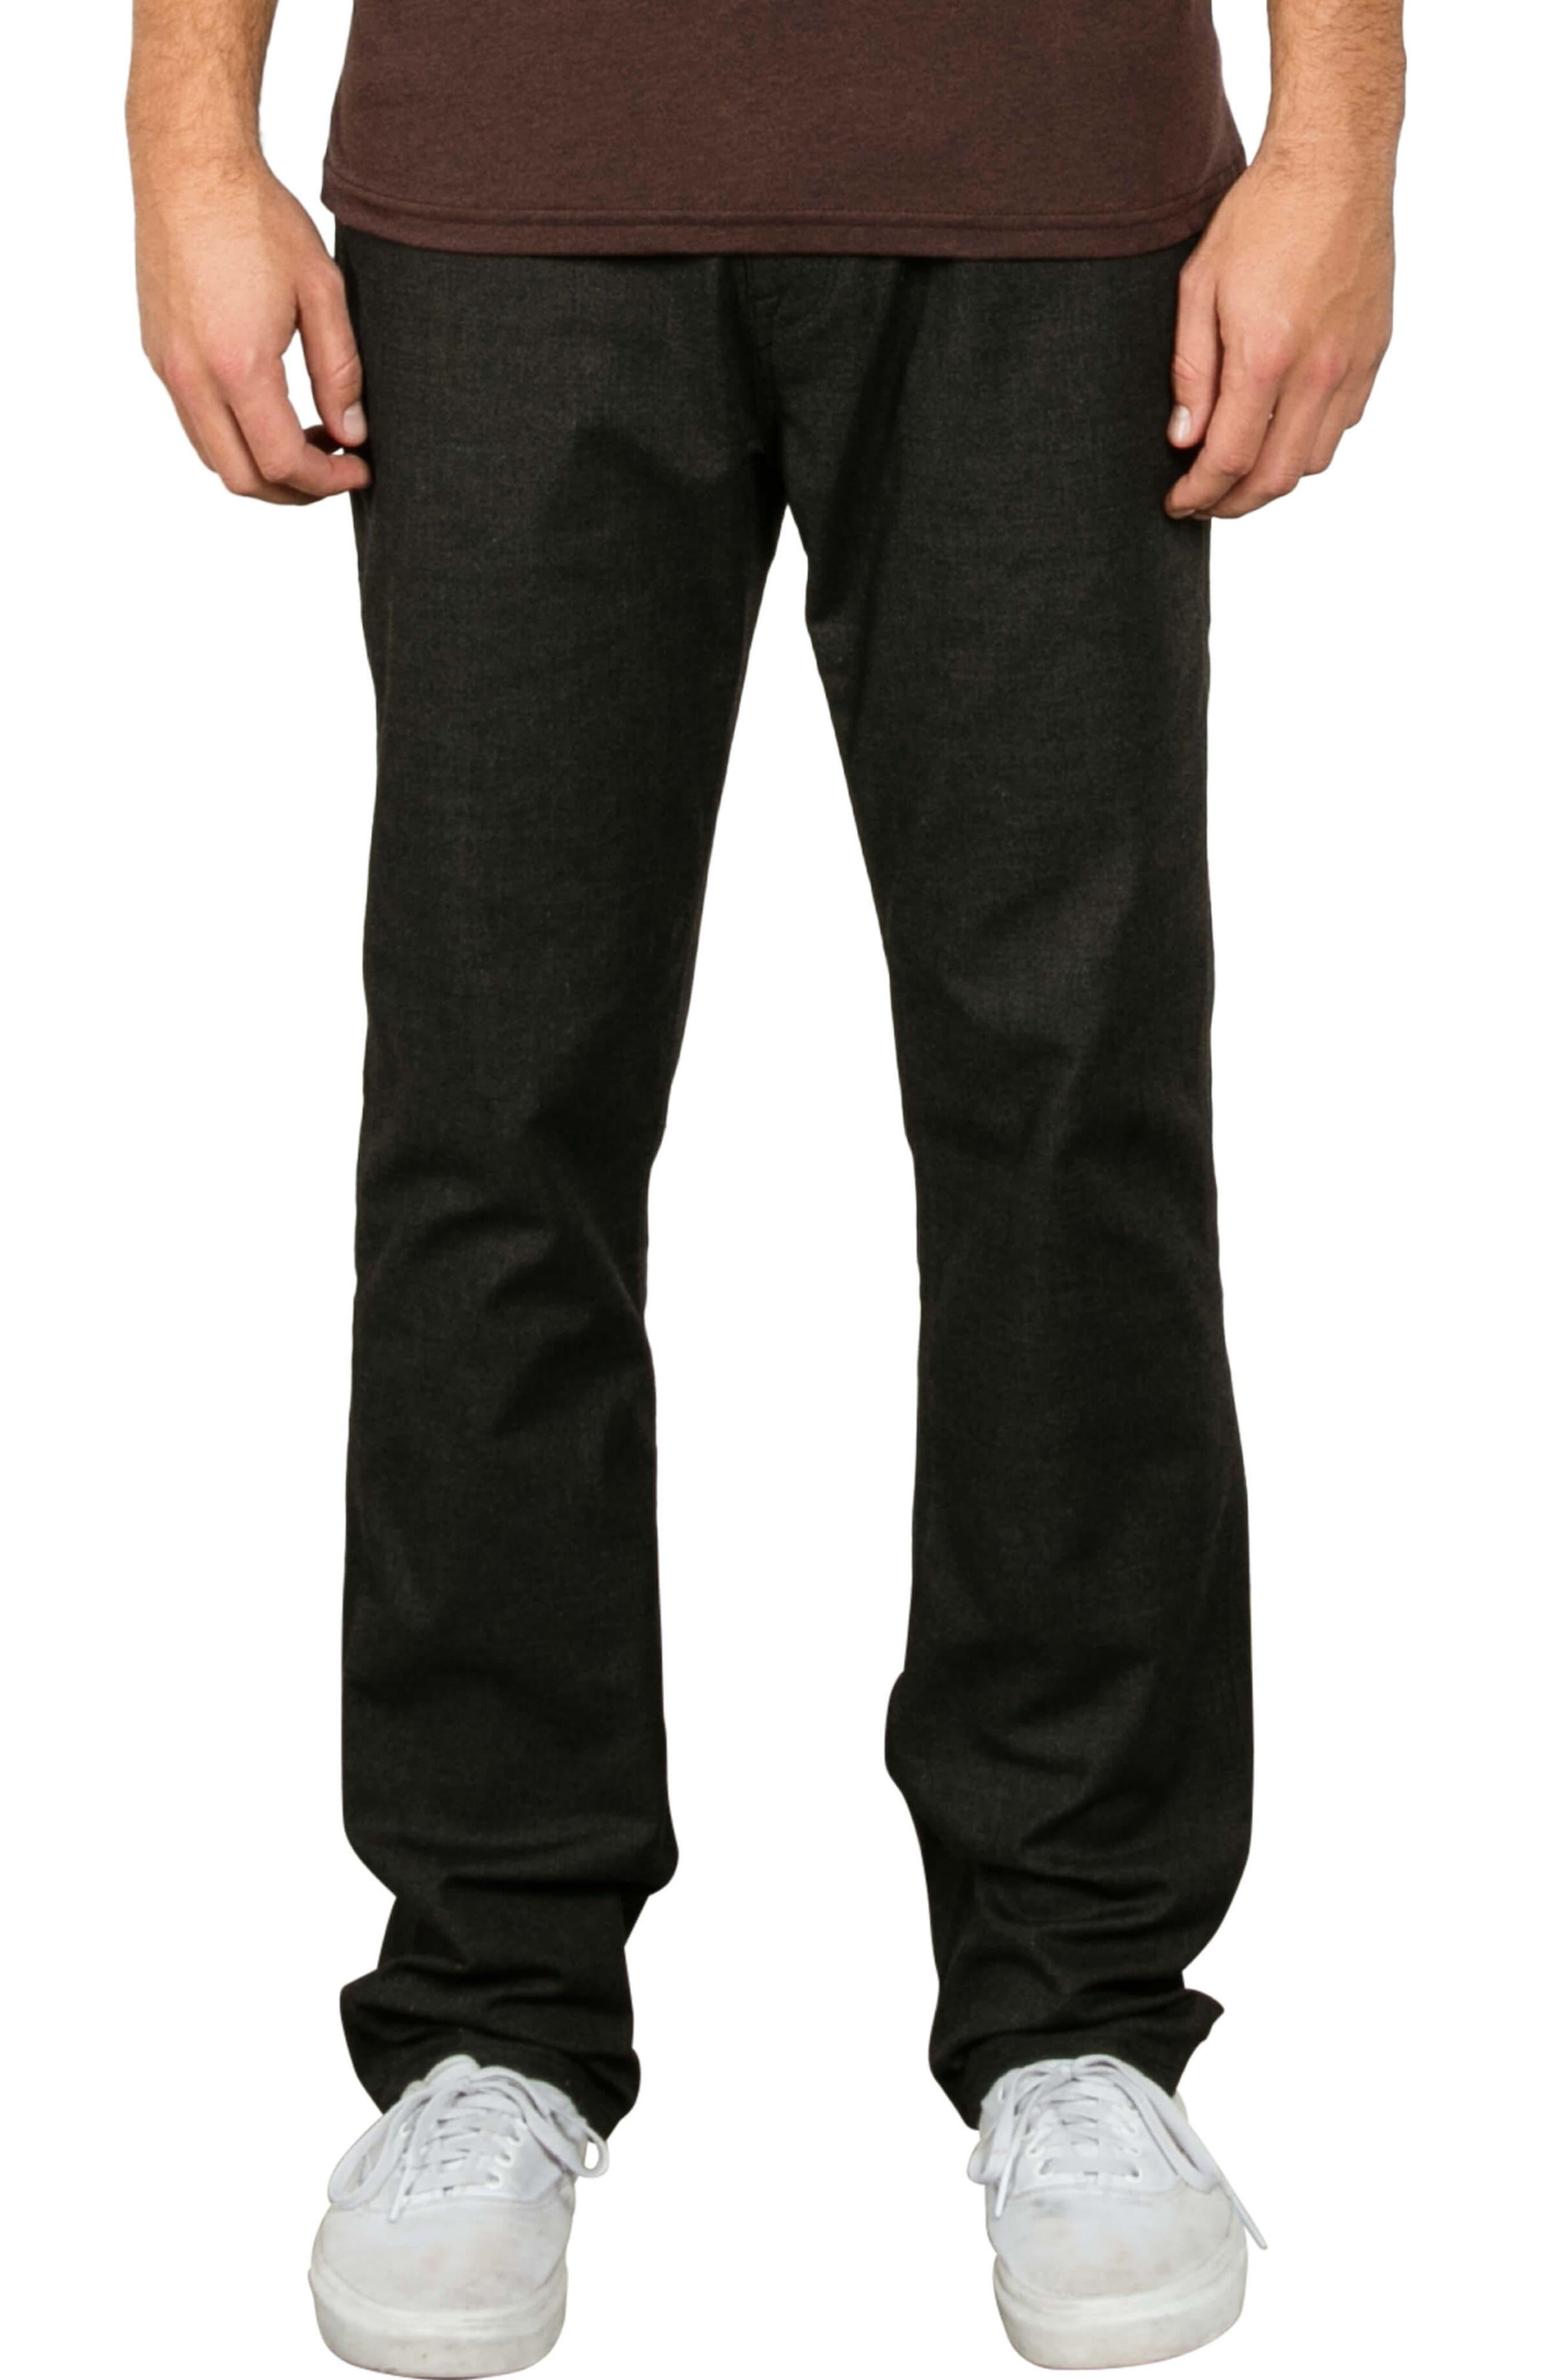 Gritter Modern Thrifter Pants,                         Main,                         color,